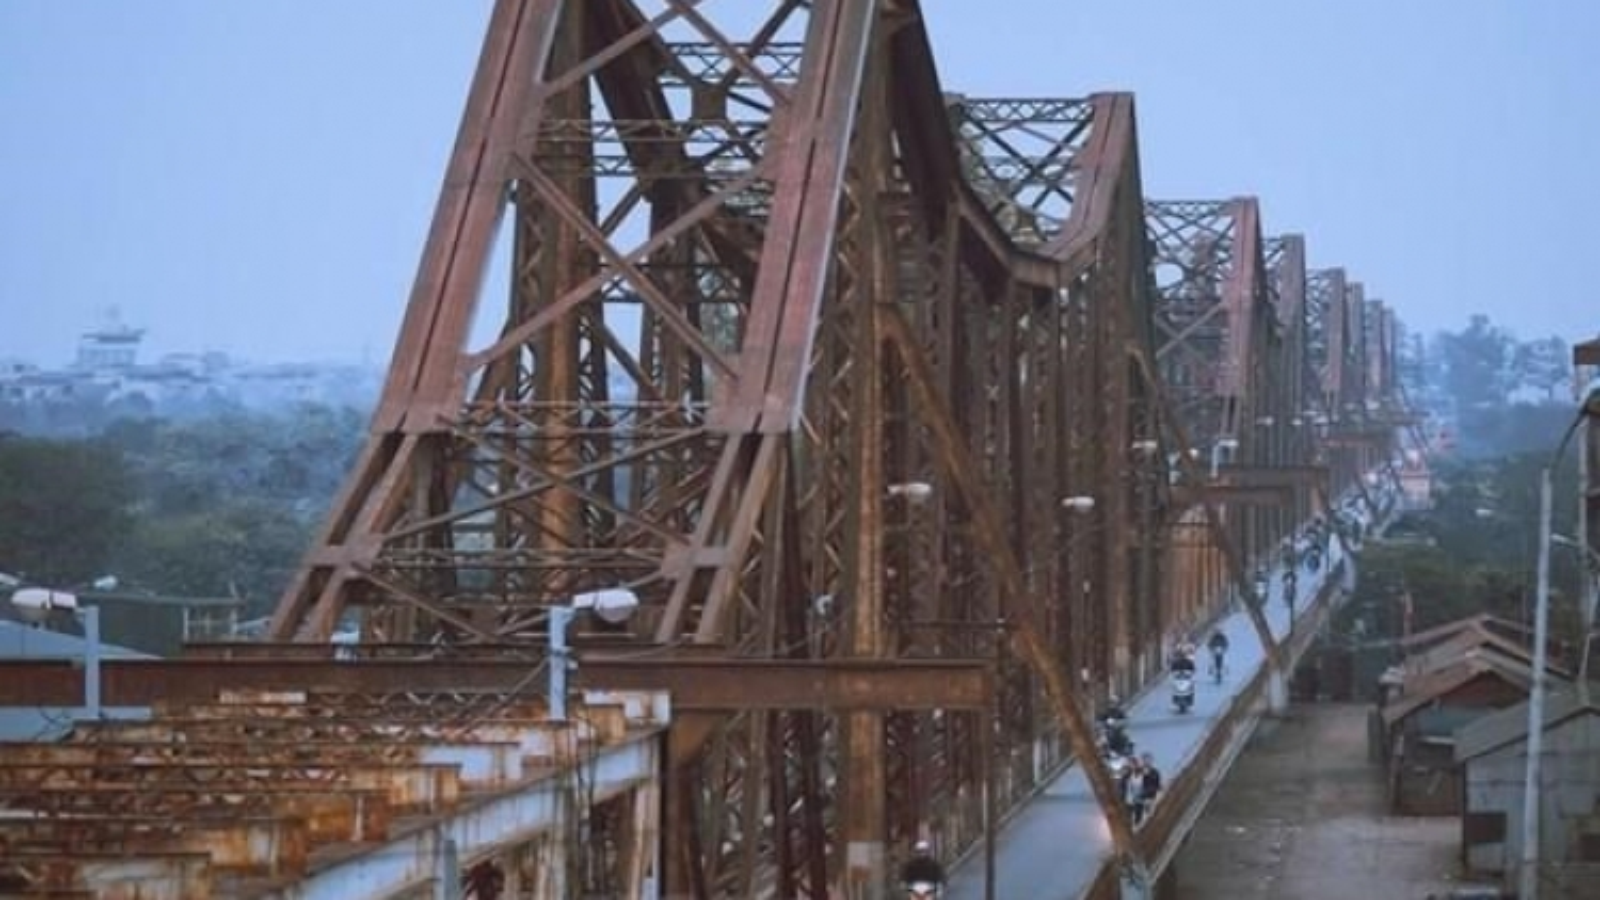 Transport Ministry to prioritise funding for maintenance of Long Bien Bridge